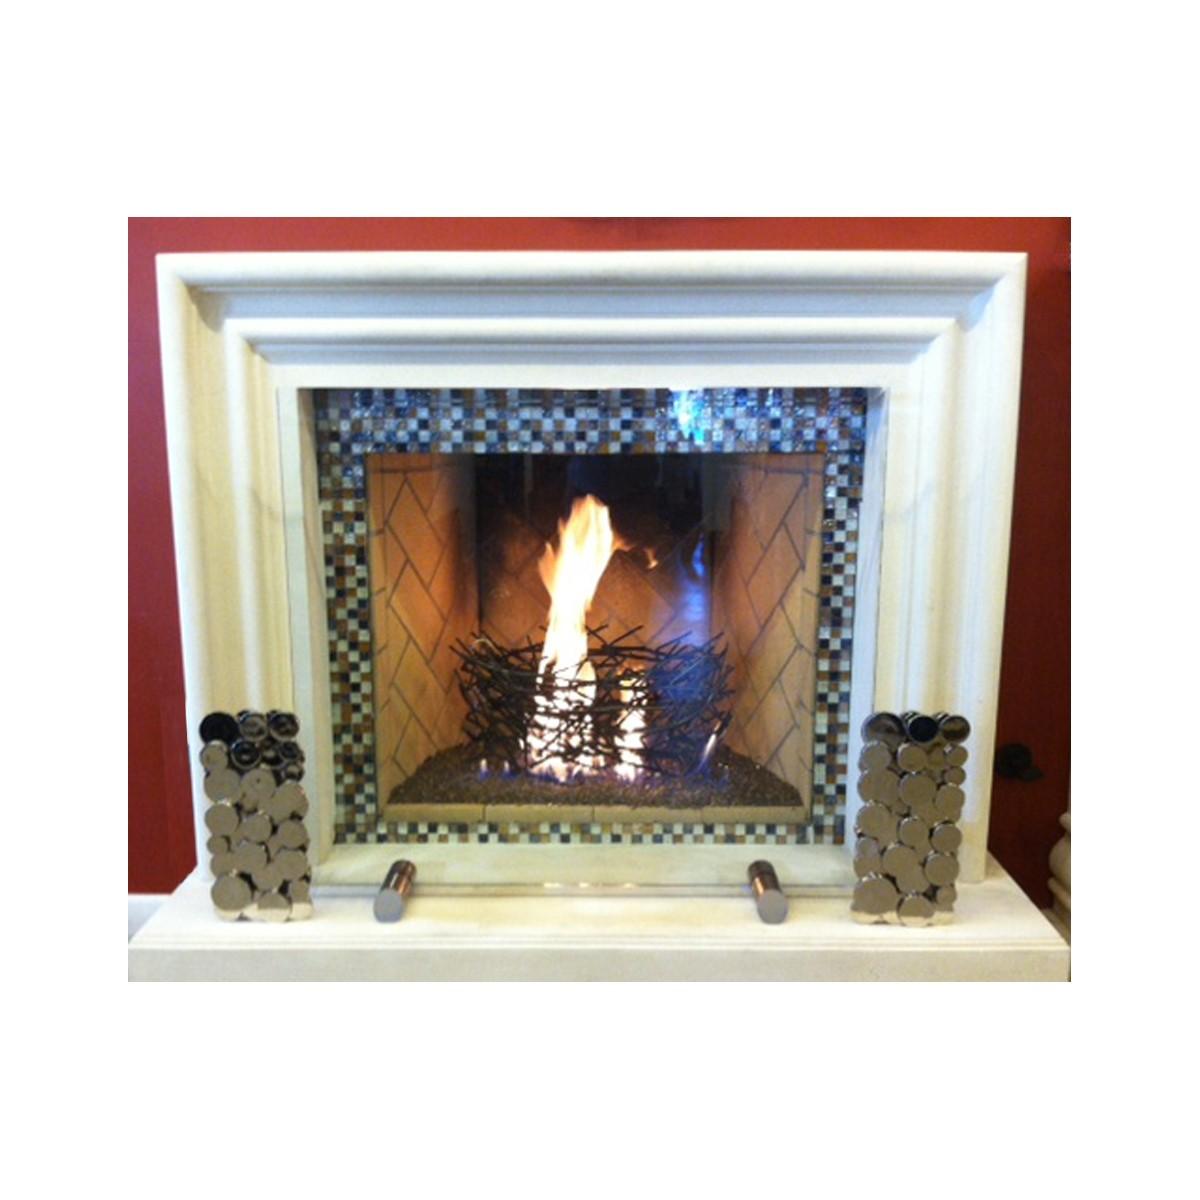 Wilshire Fireplace Santa Monica Fireplaces